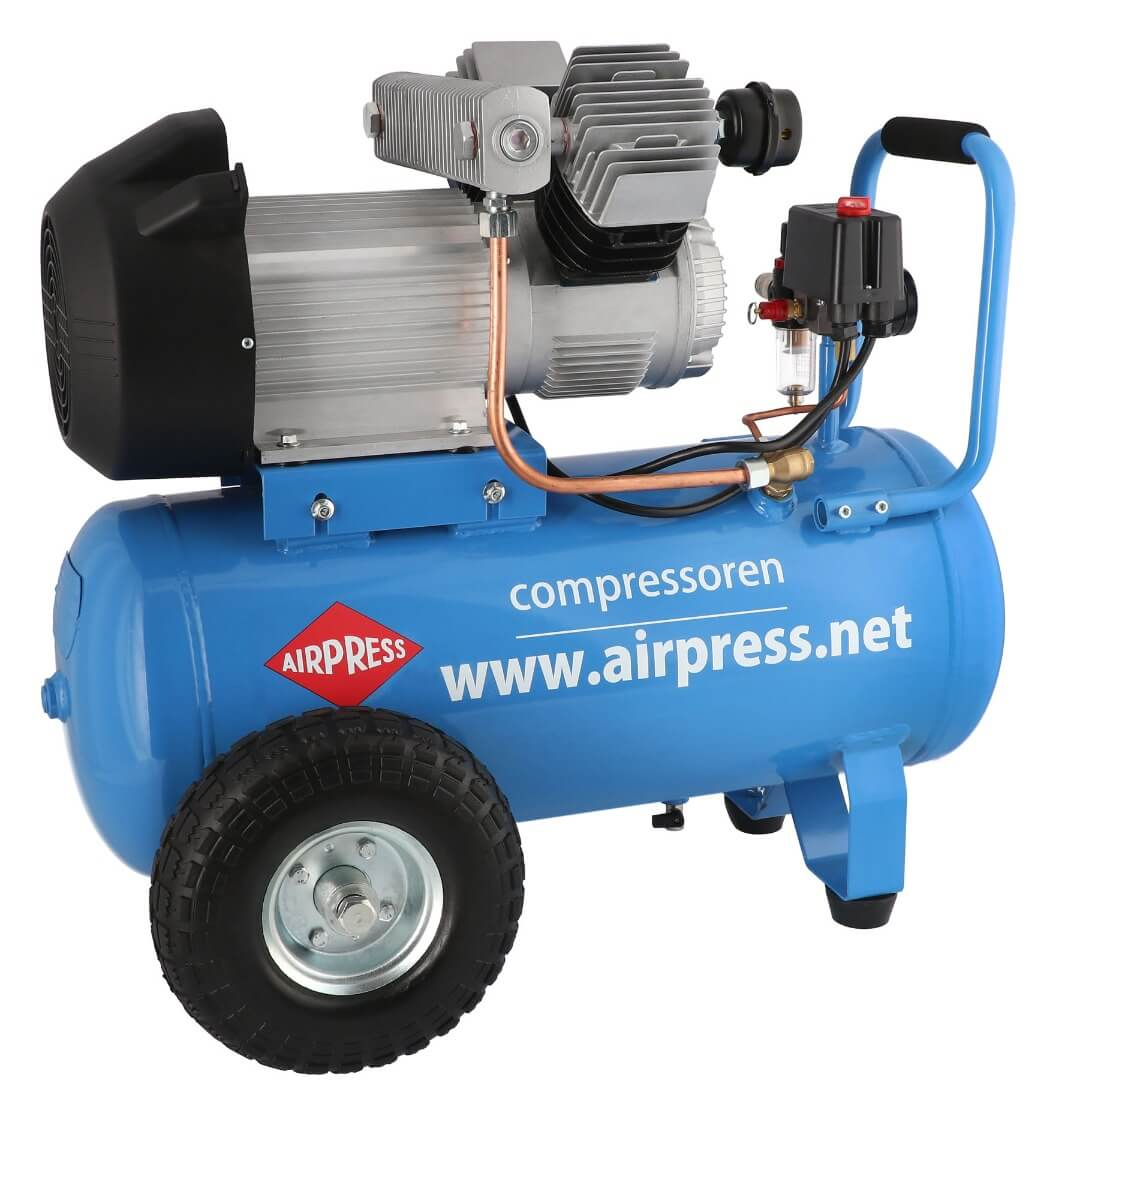 LM 50-350 compressor